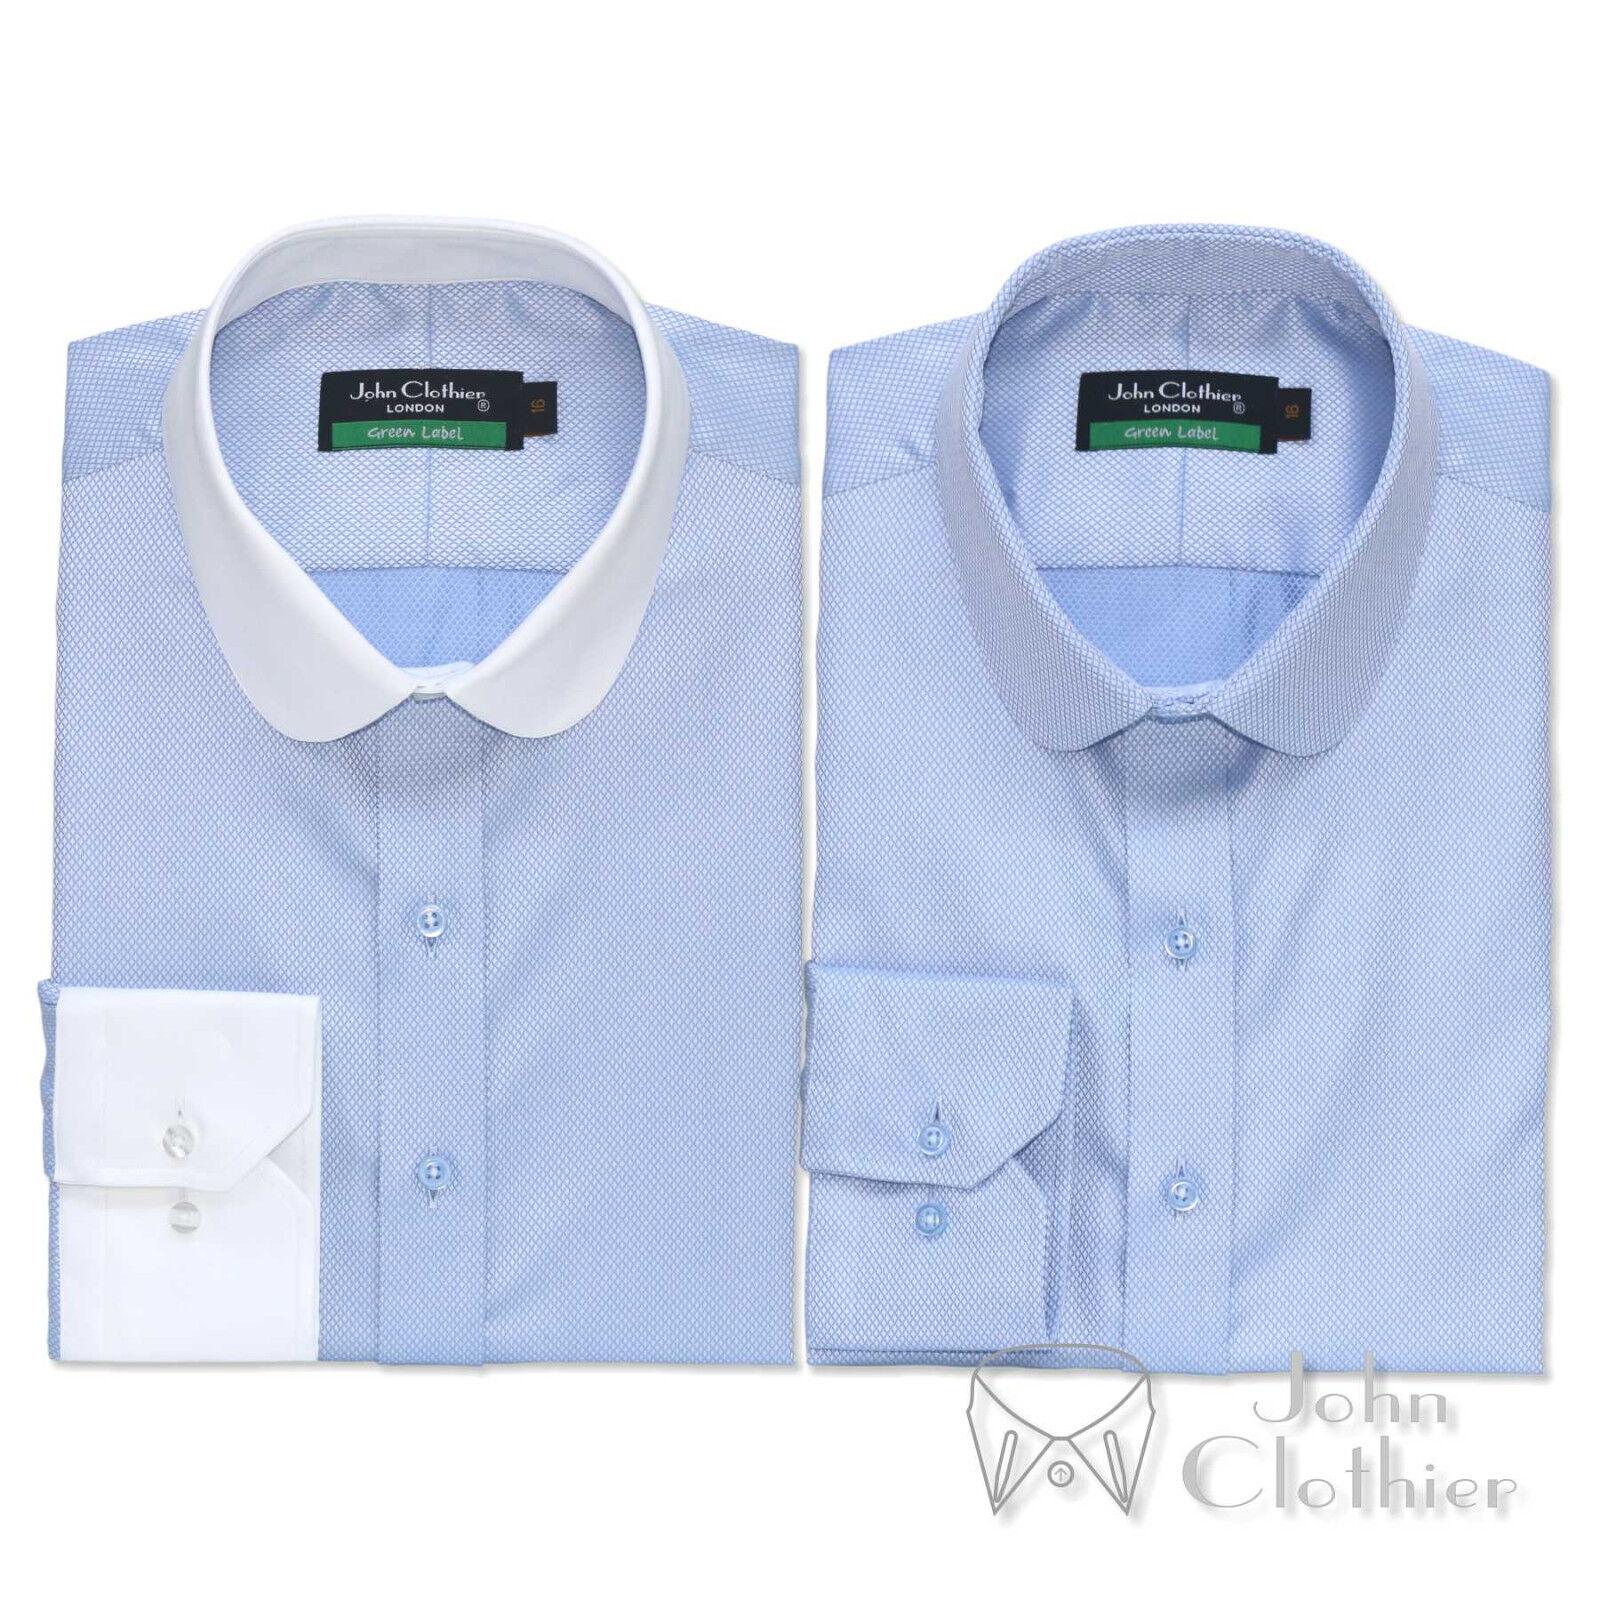 Herren Cotton Penny collar shirt Sky Blau diamond dobby Club collar Gents Round